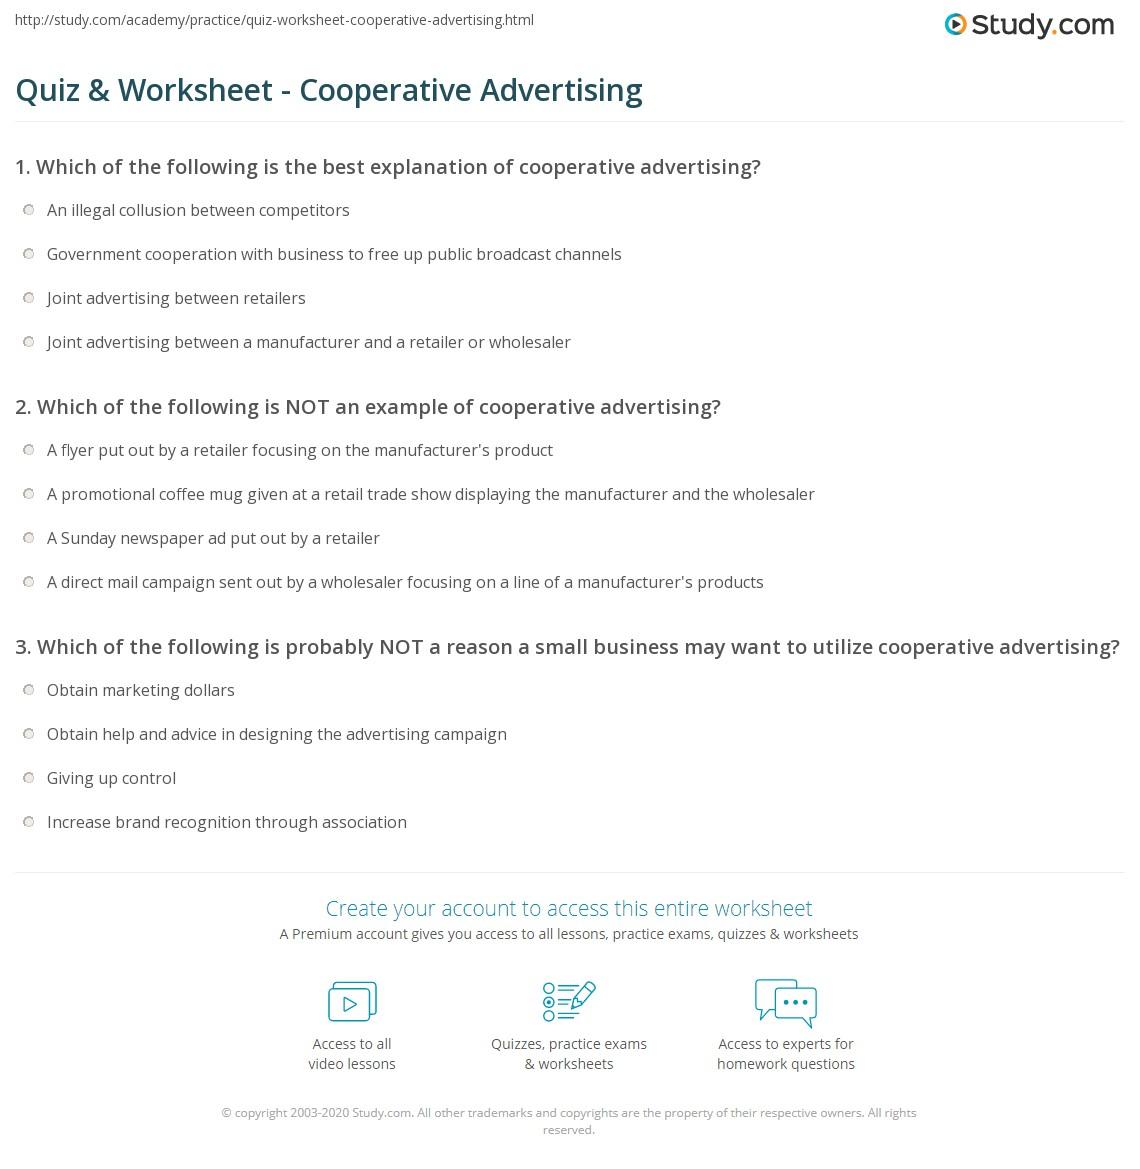 quiz & worksheet - cooperative advertising | study